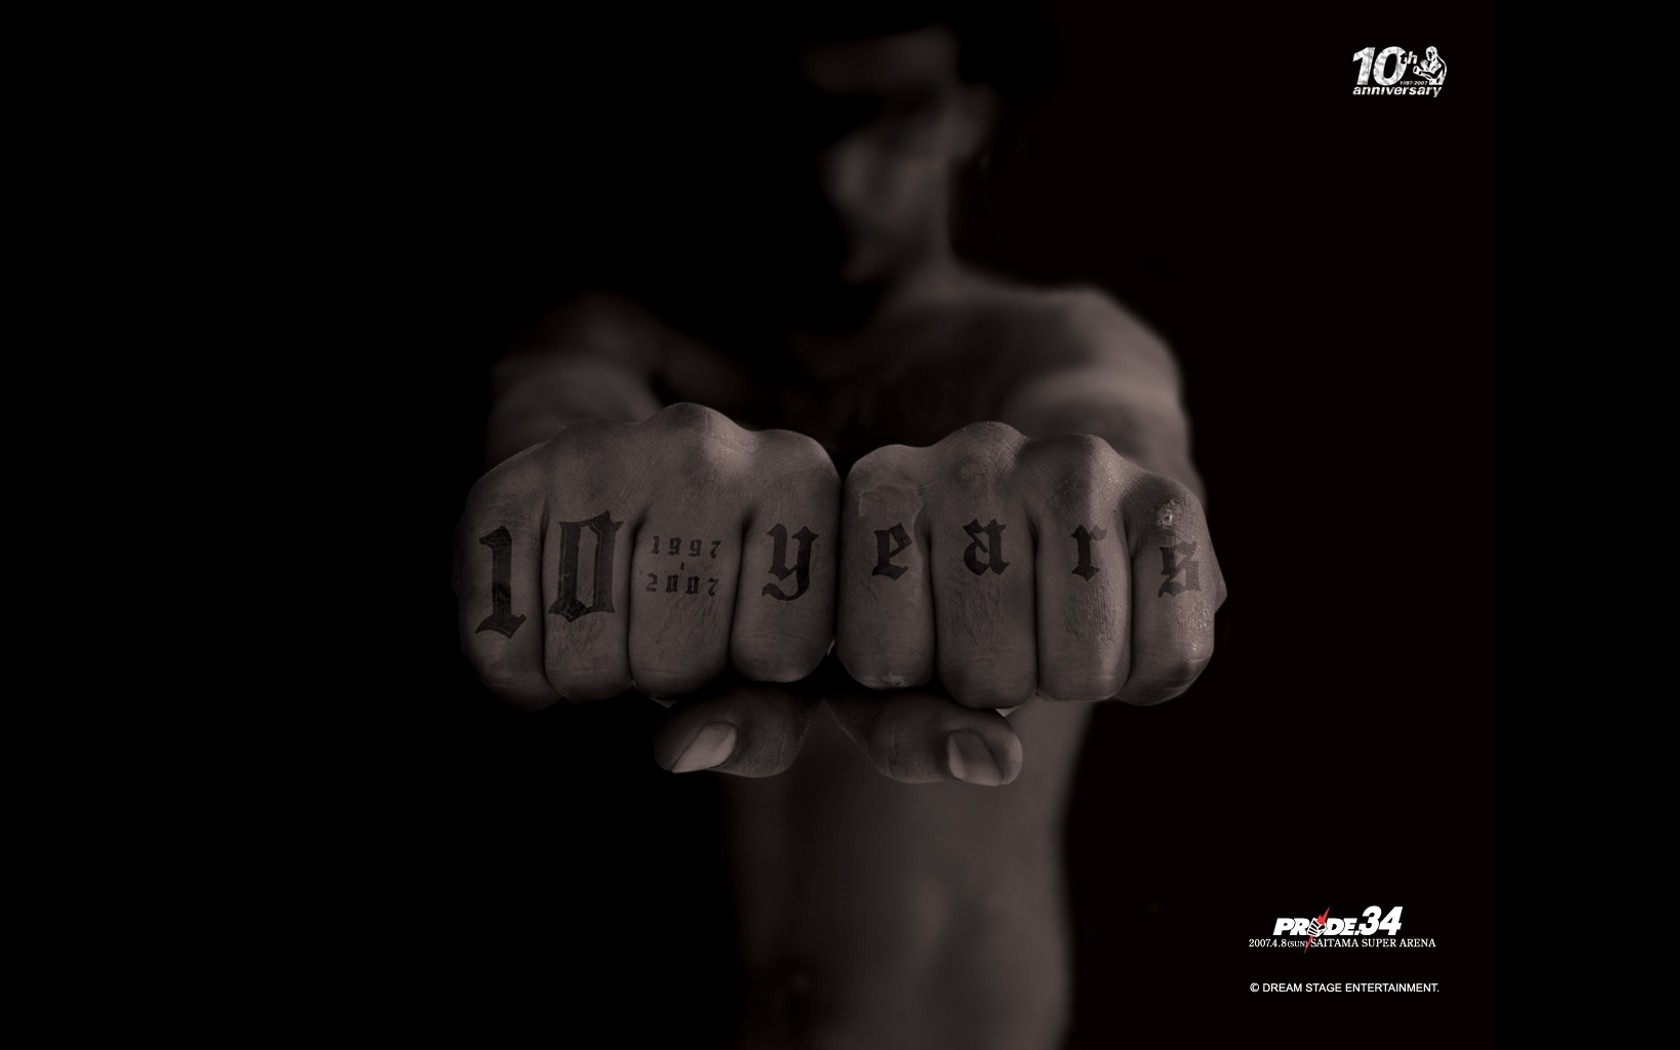 Download MMA UFC Wallpaper 1680x1050 MMA UFC PRIDE Fighting 1680x1050